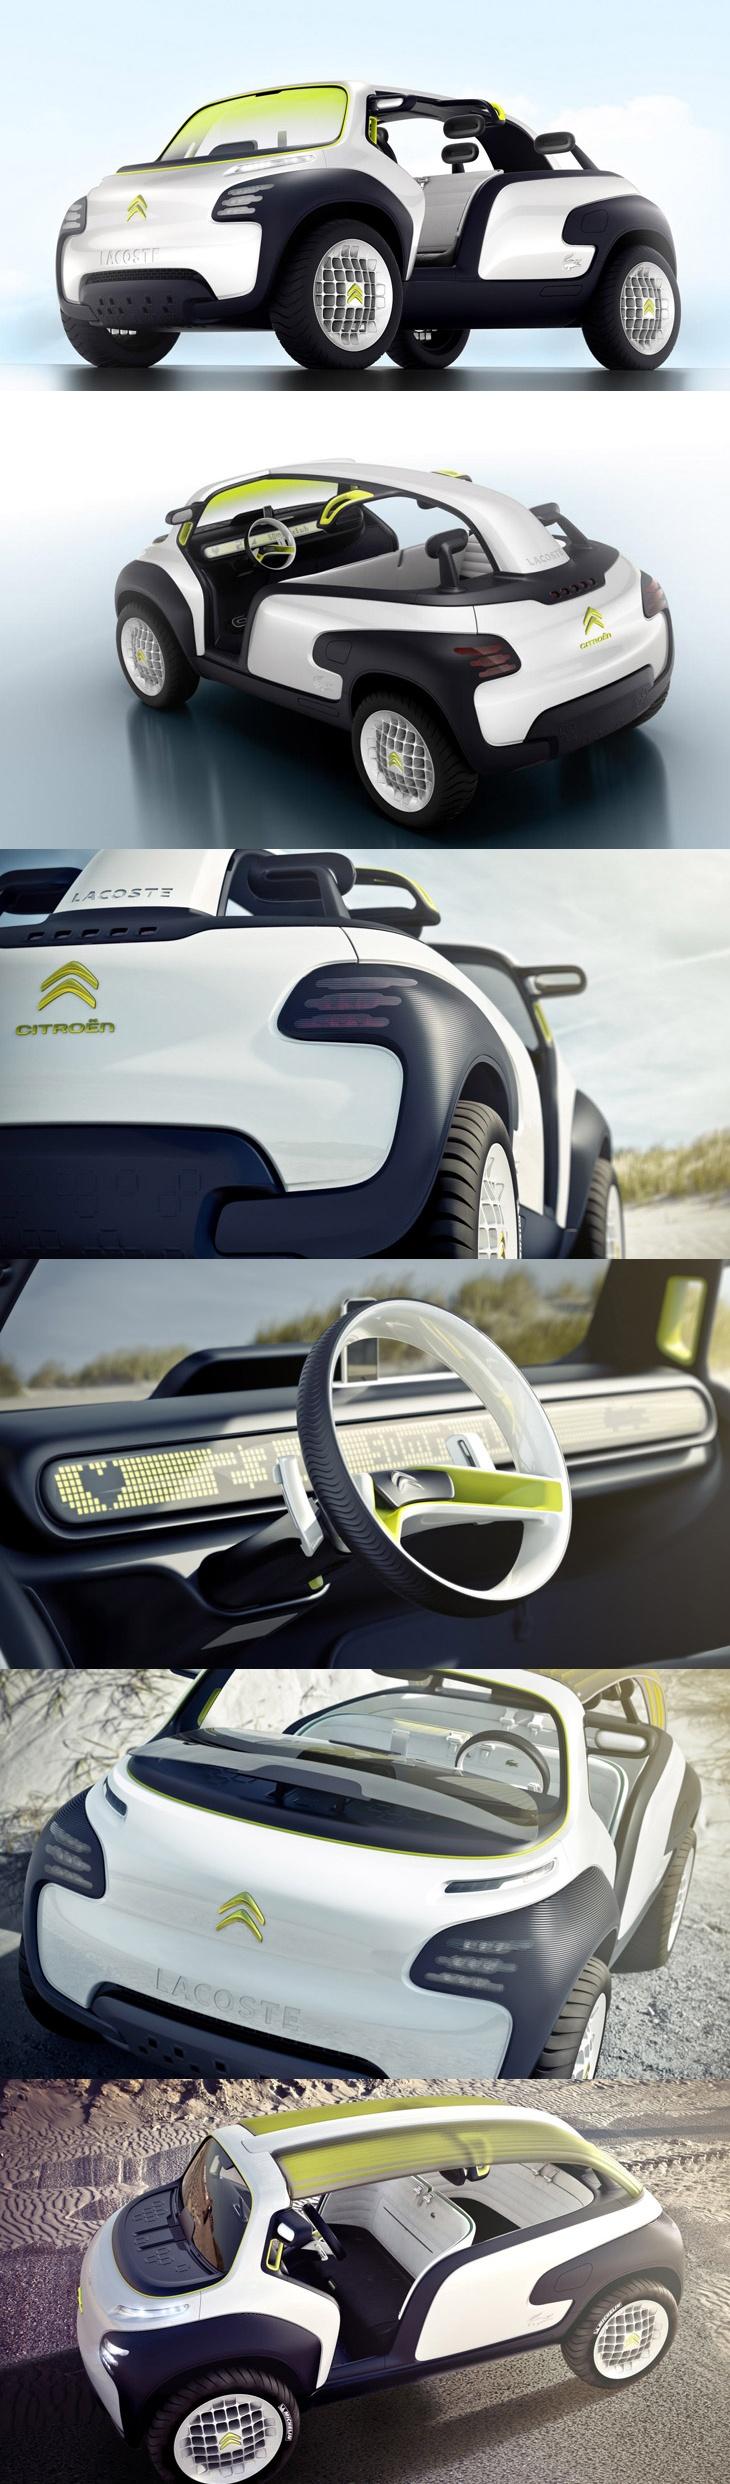 Concept car - CitroA«n   Lacoste = funny future car! lol